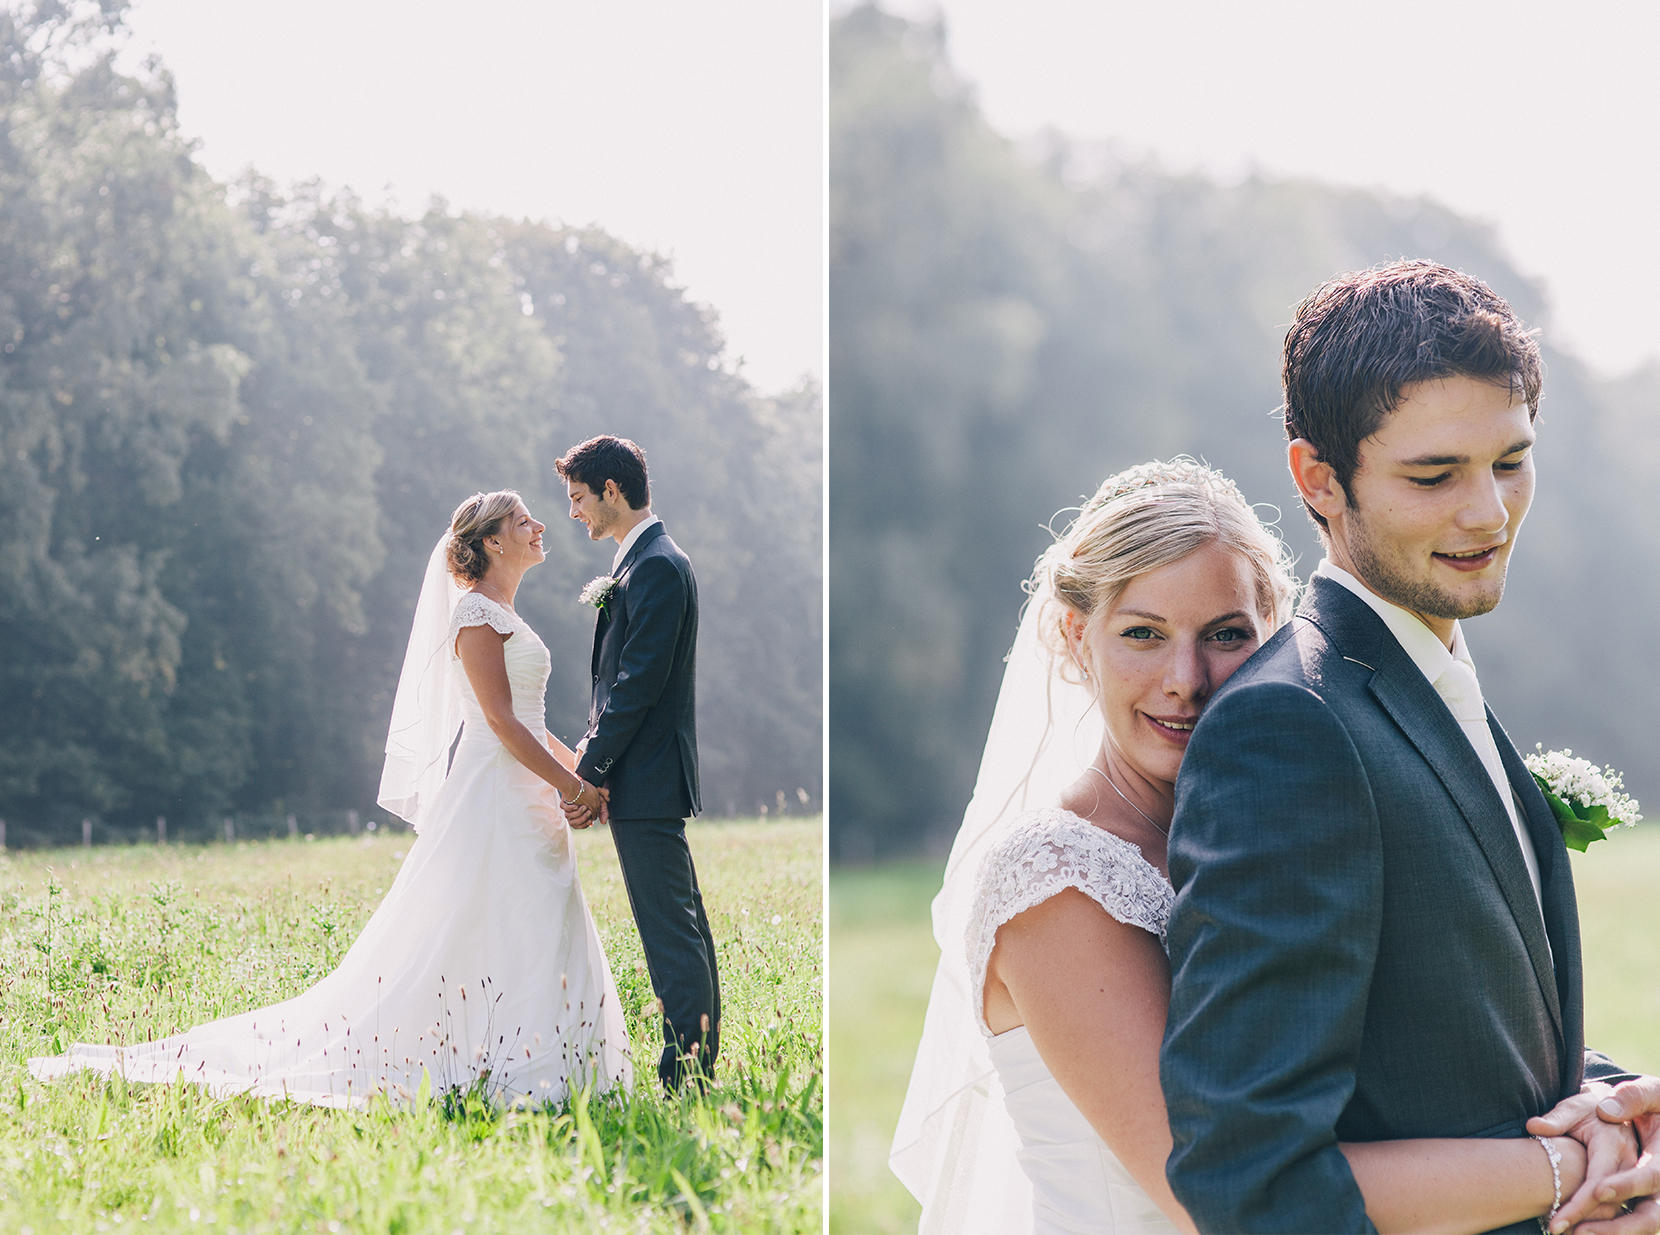 Bruidsfotografie_Nunspeet_Herman_Janienke-10